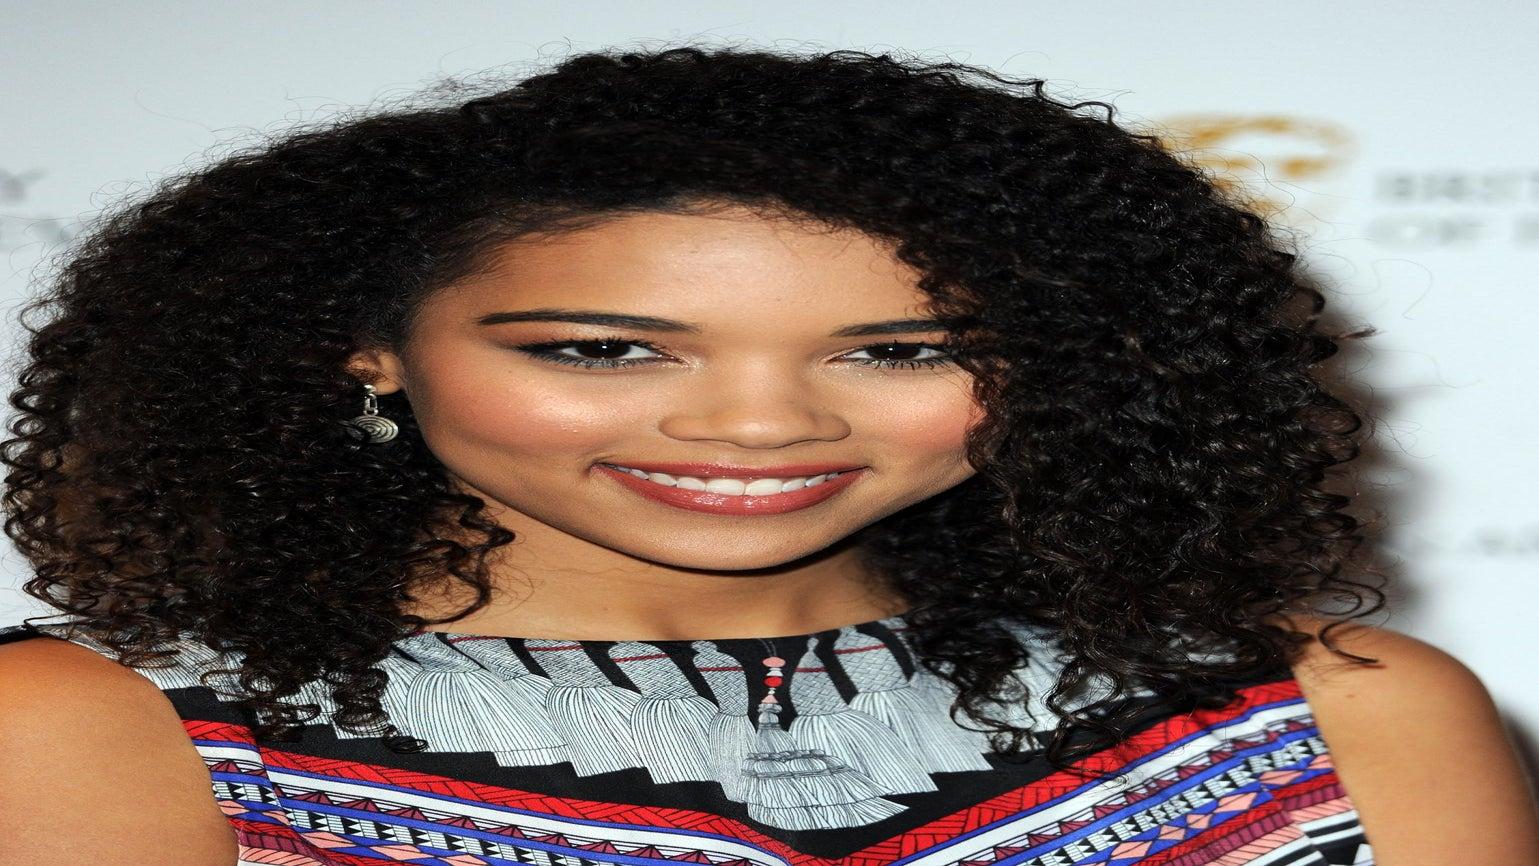 Aaliyah Biopic Has a New Star: Meet Alexandra Shipp